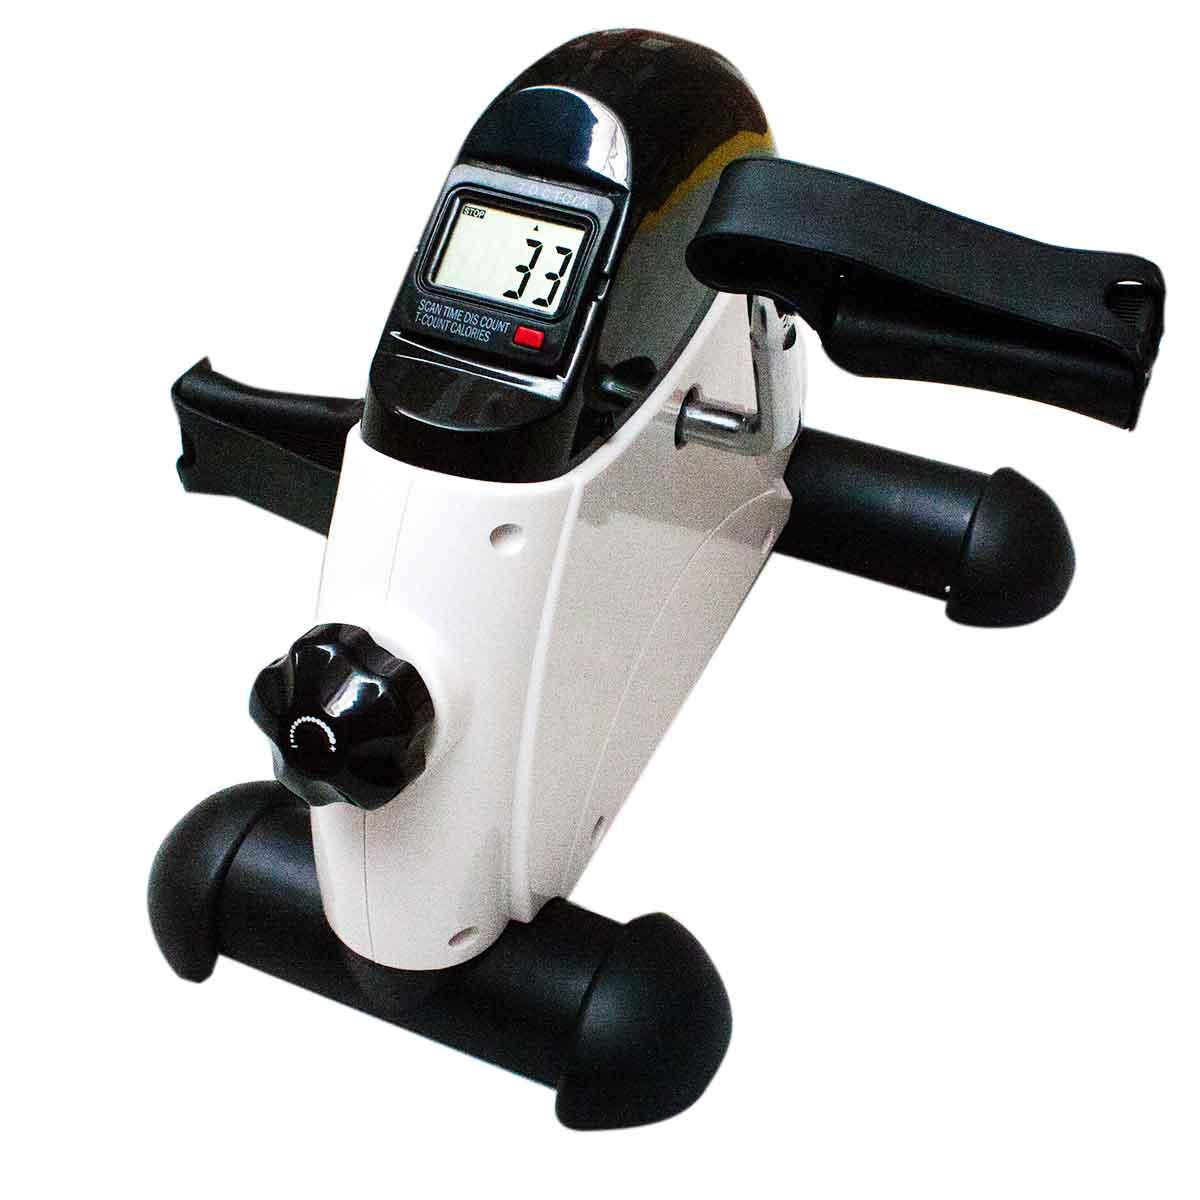 Mini Bicicleta Bike Ergométrica Exercício Fisioterapia